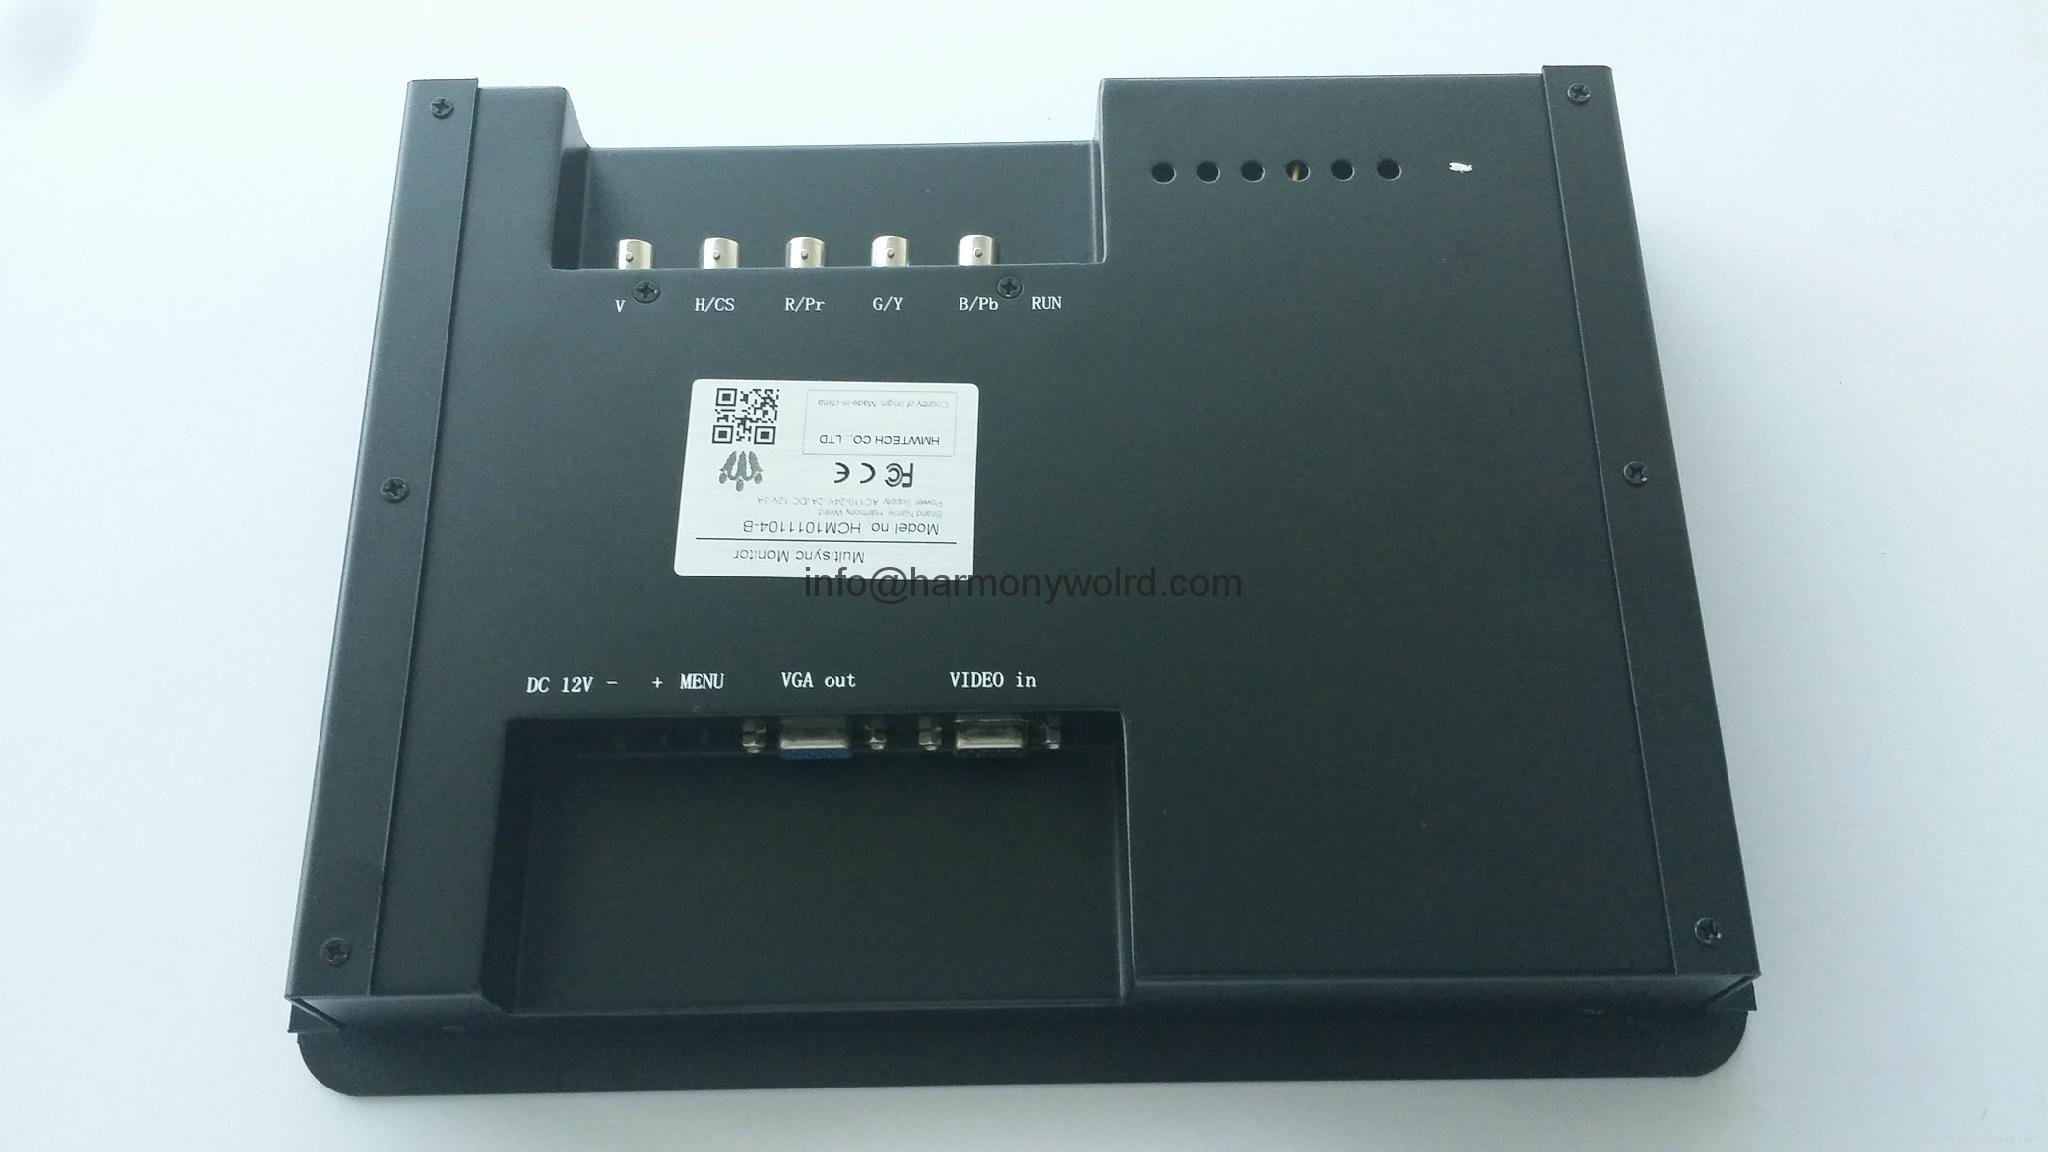 "Upgrade JAVELIN BWM12B BWM9 BWM9B BWM9C B /W 9""/ 12"" INCH CRT MONITOR to new LCD 7"